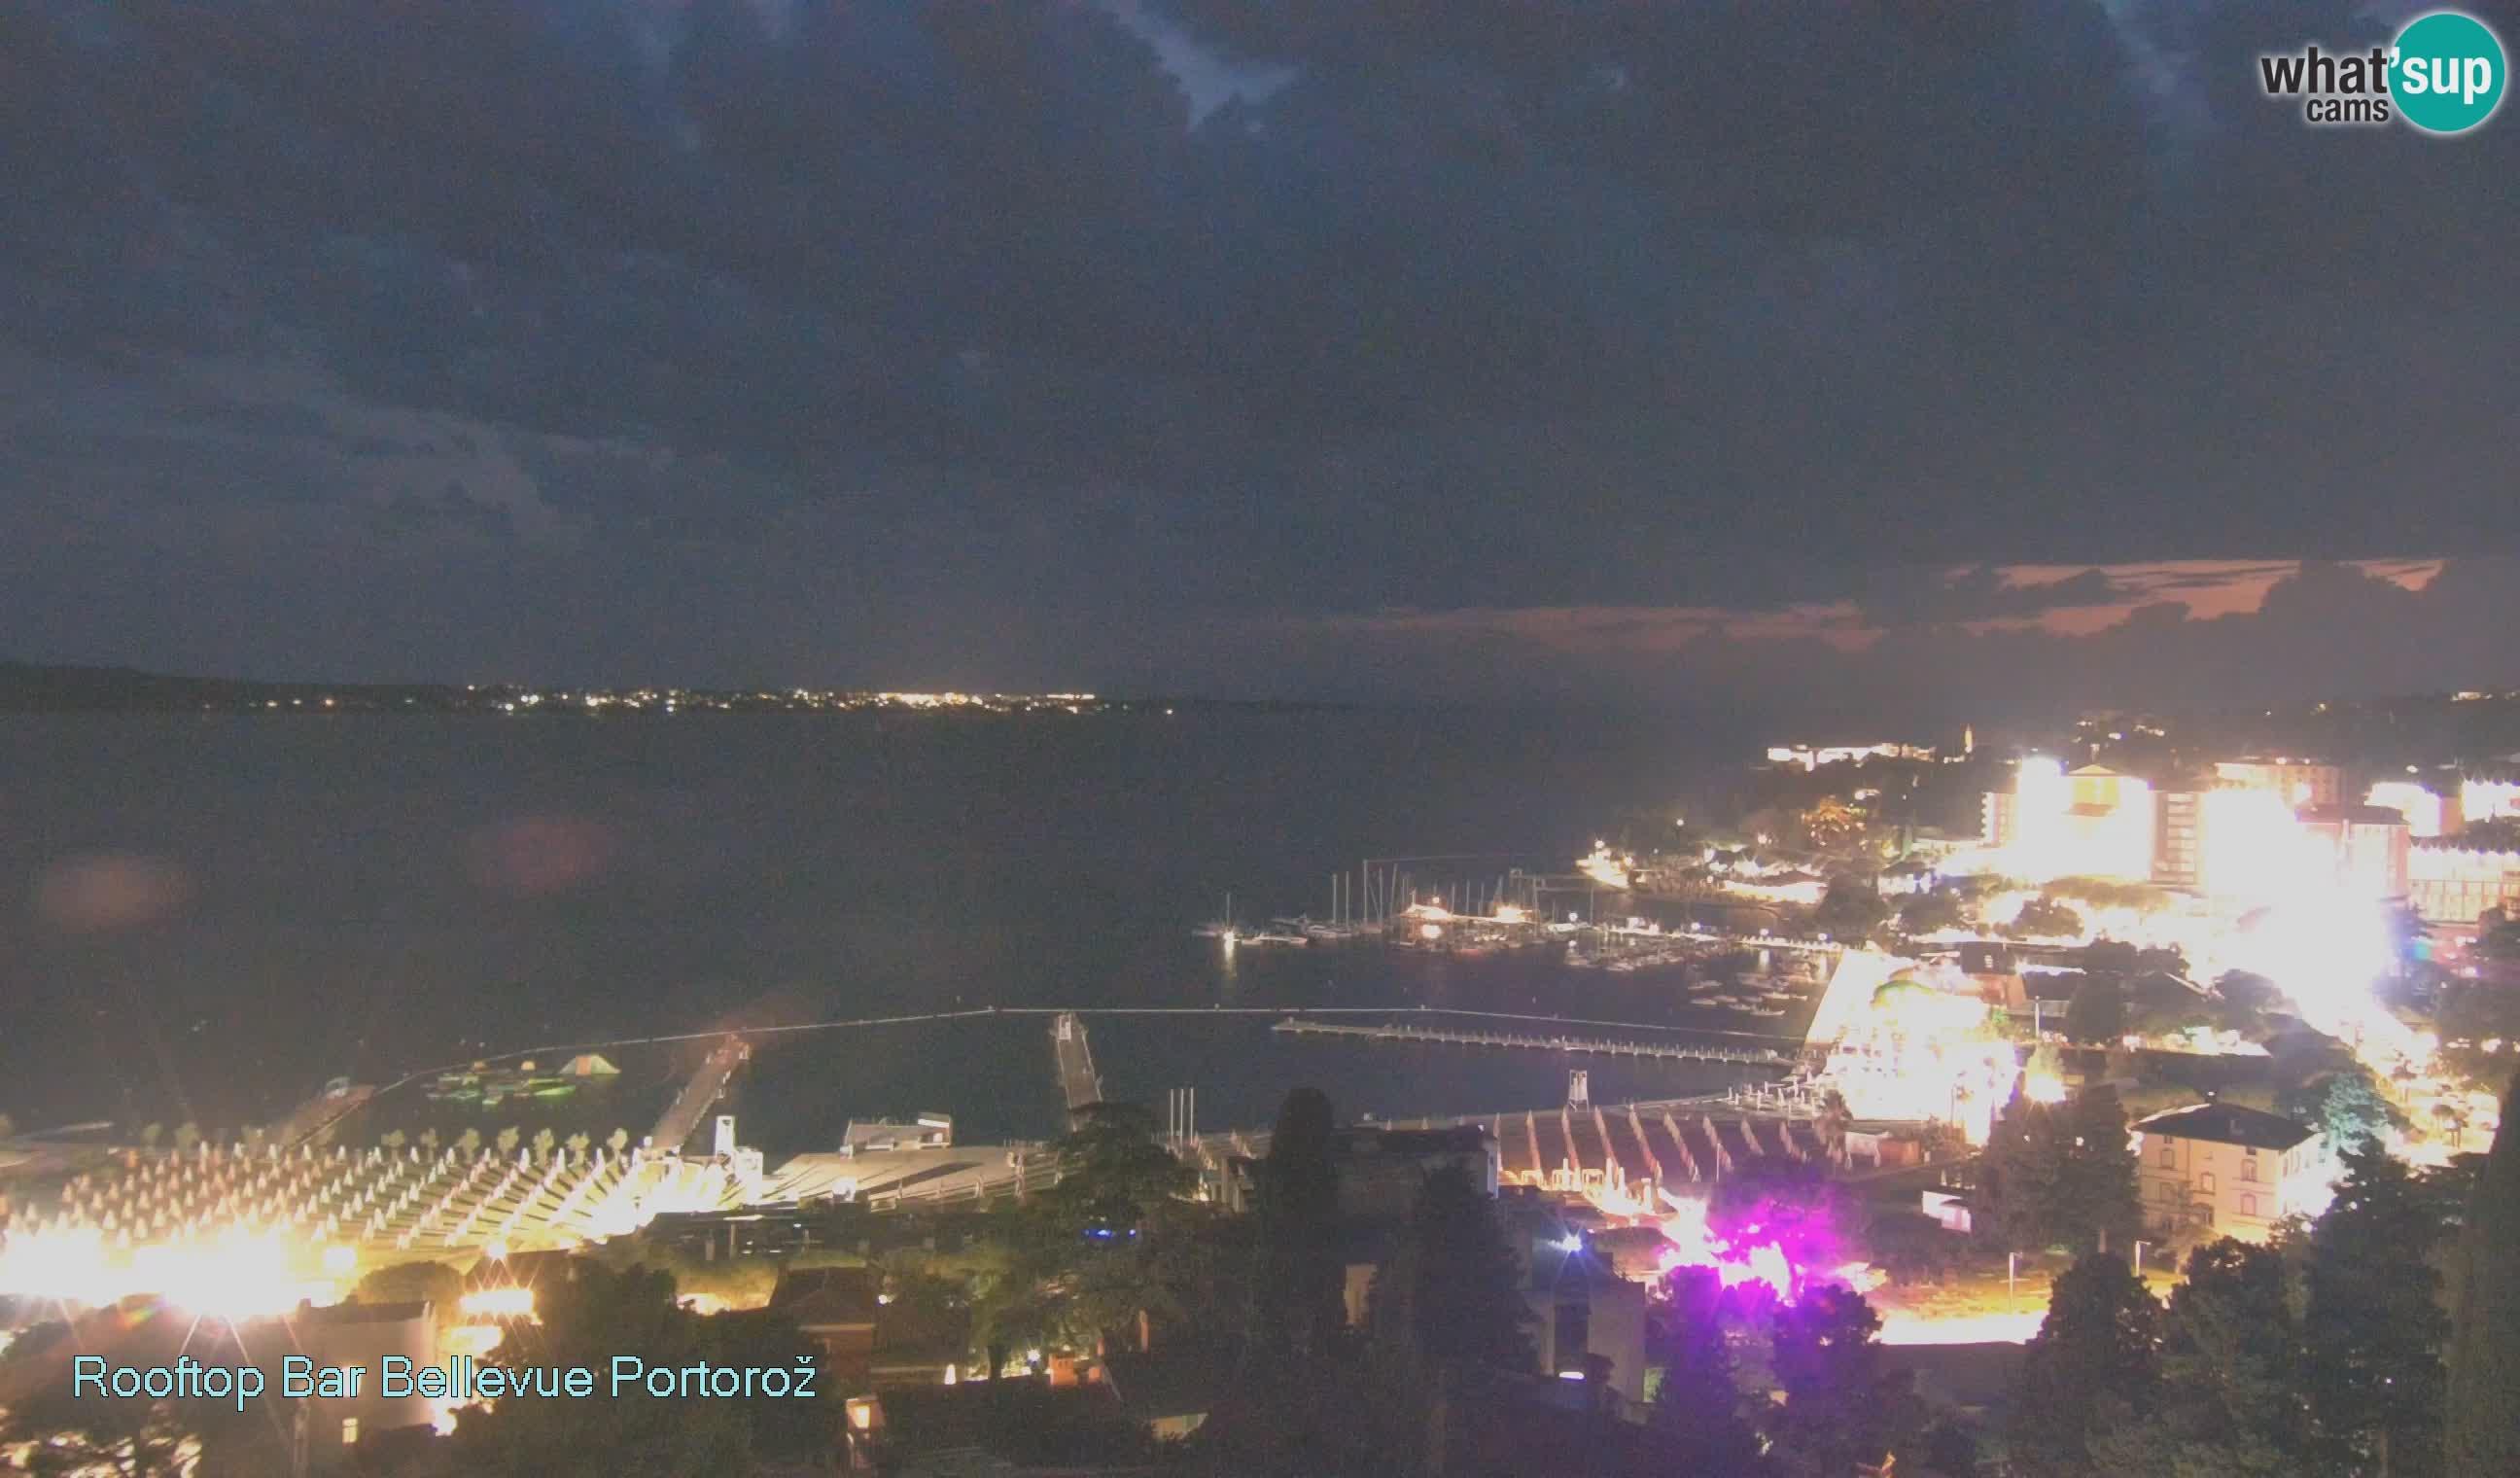 Portorož Sun. 21:35